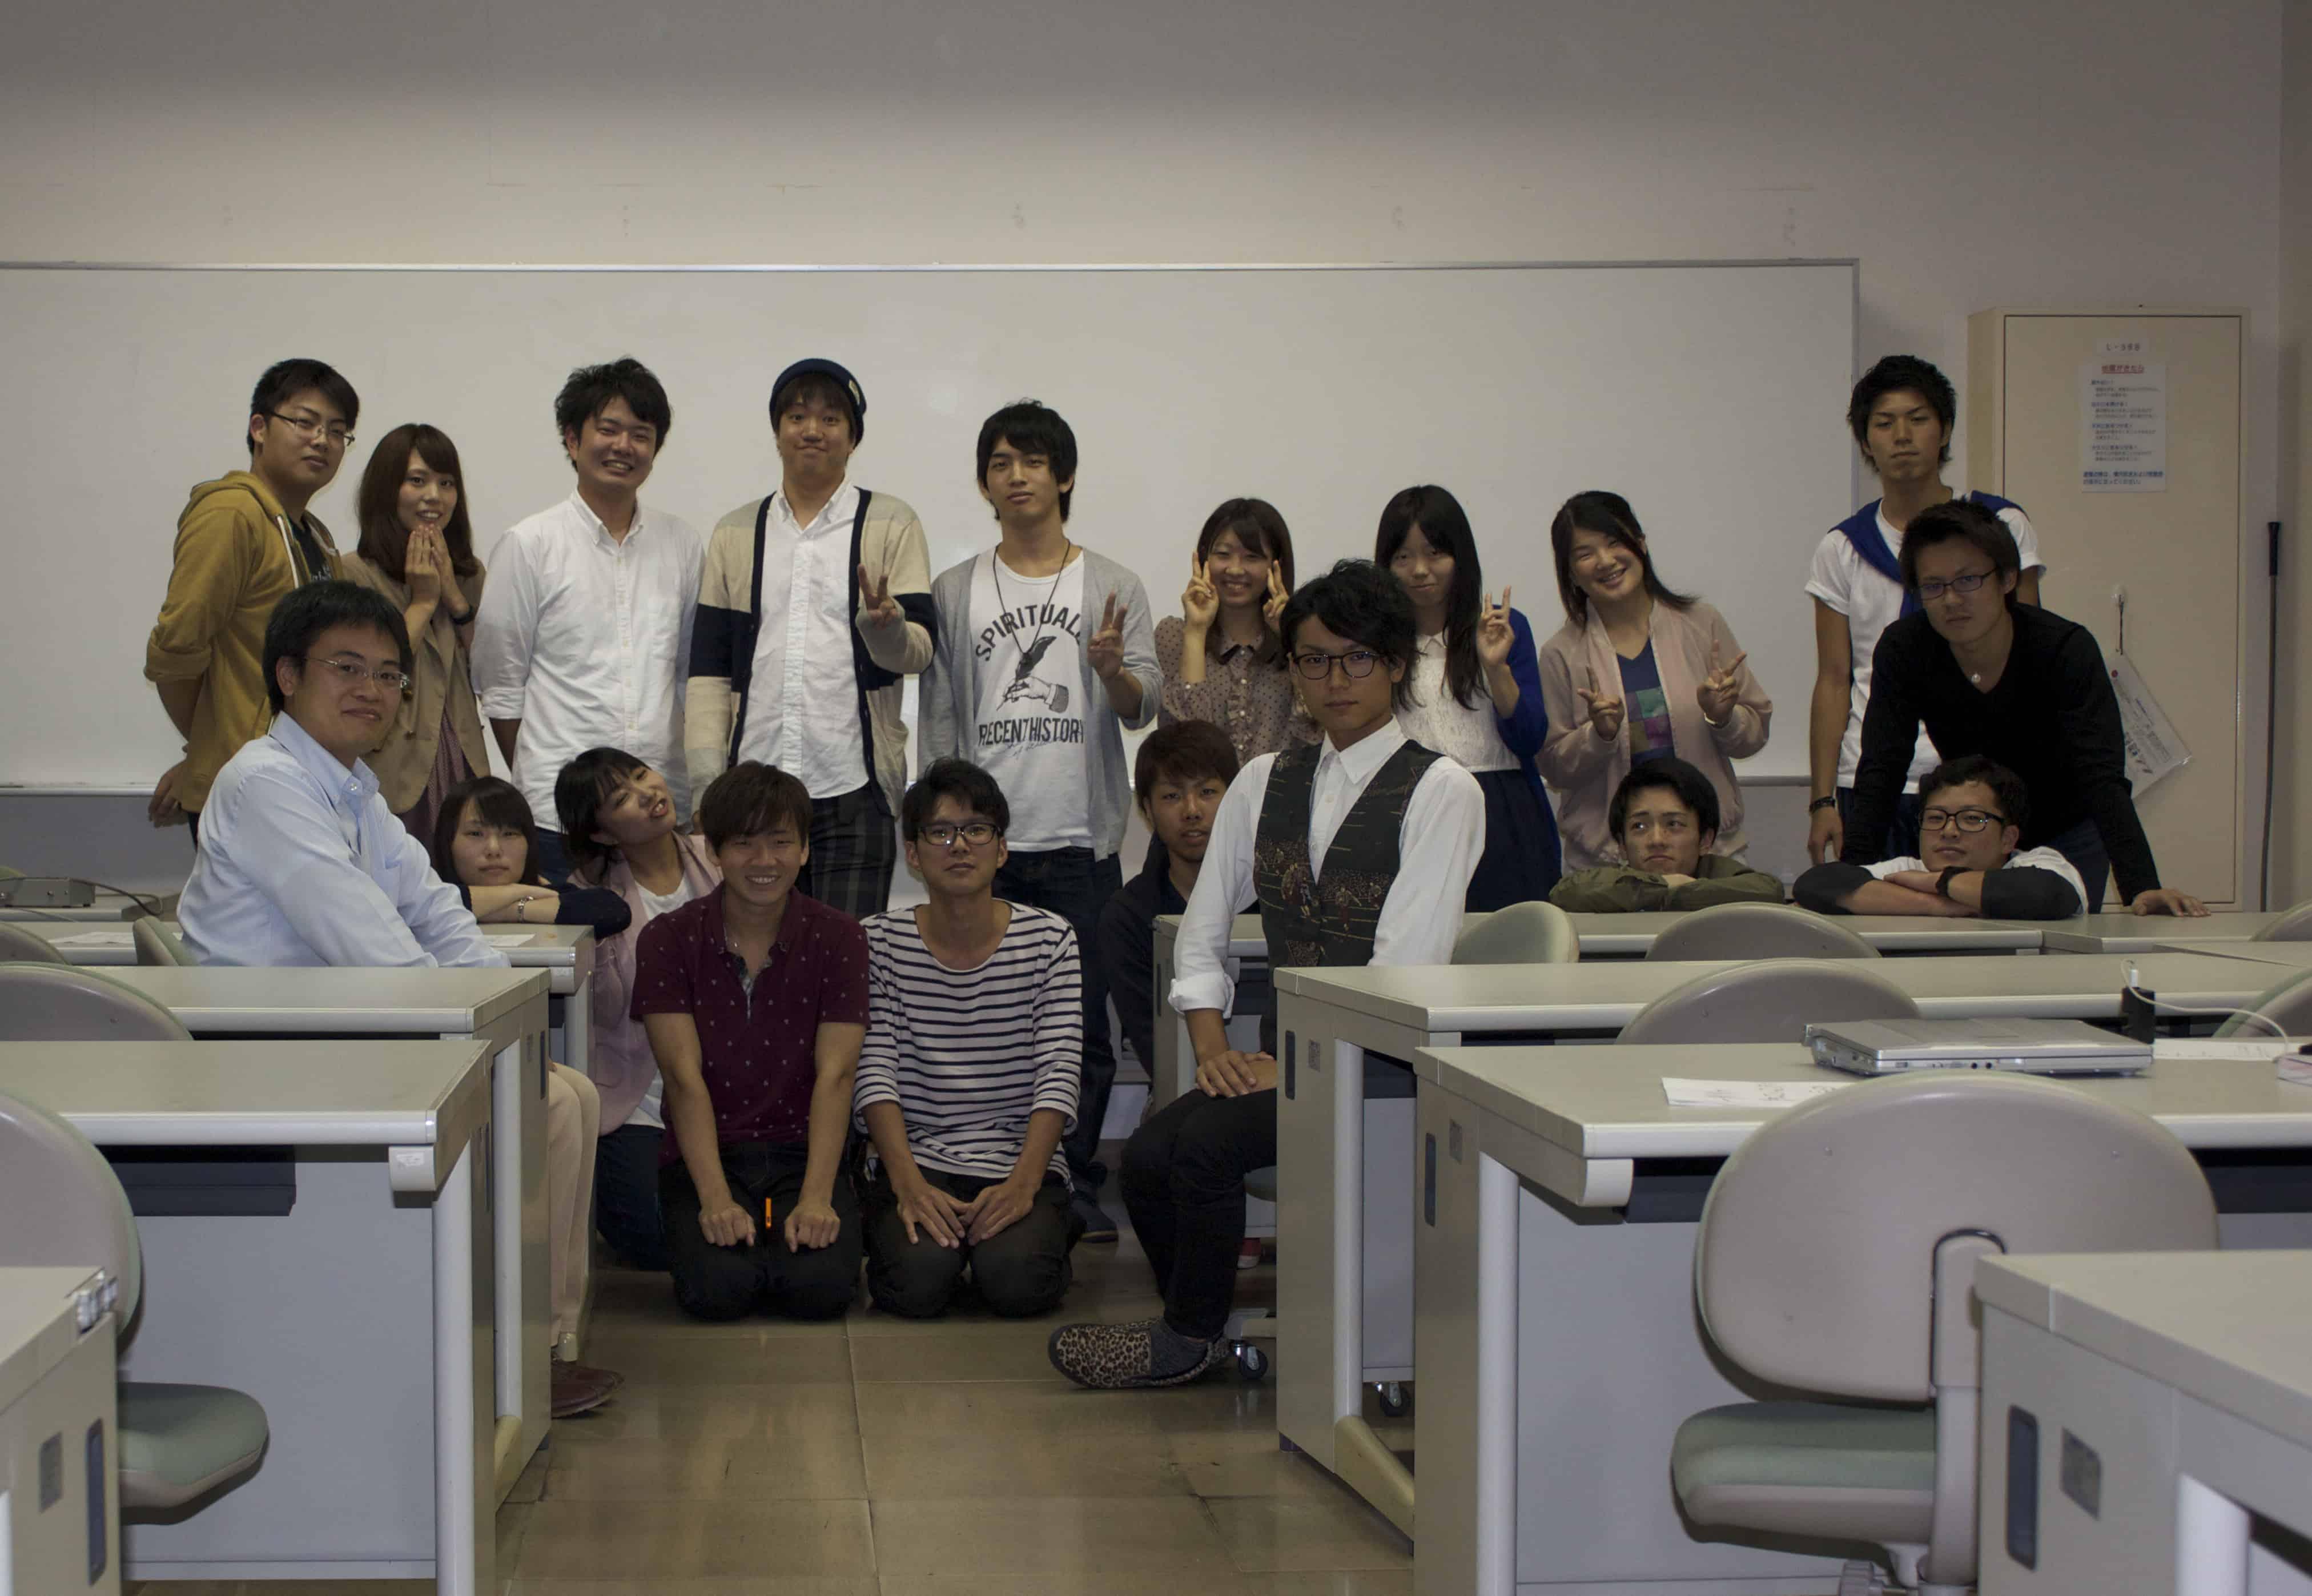 IMG 7664 - ゼミでの取り組み紹介 2013年秋